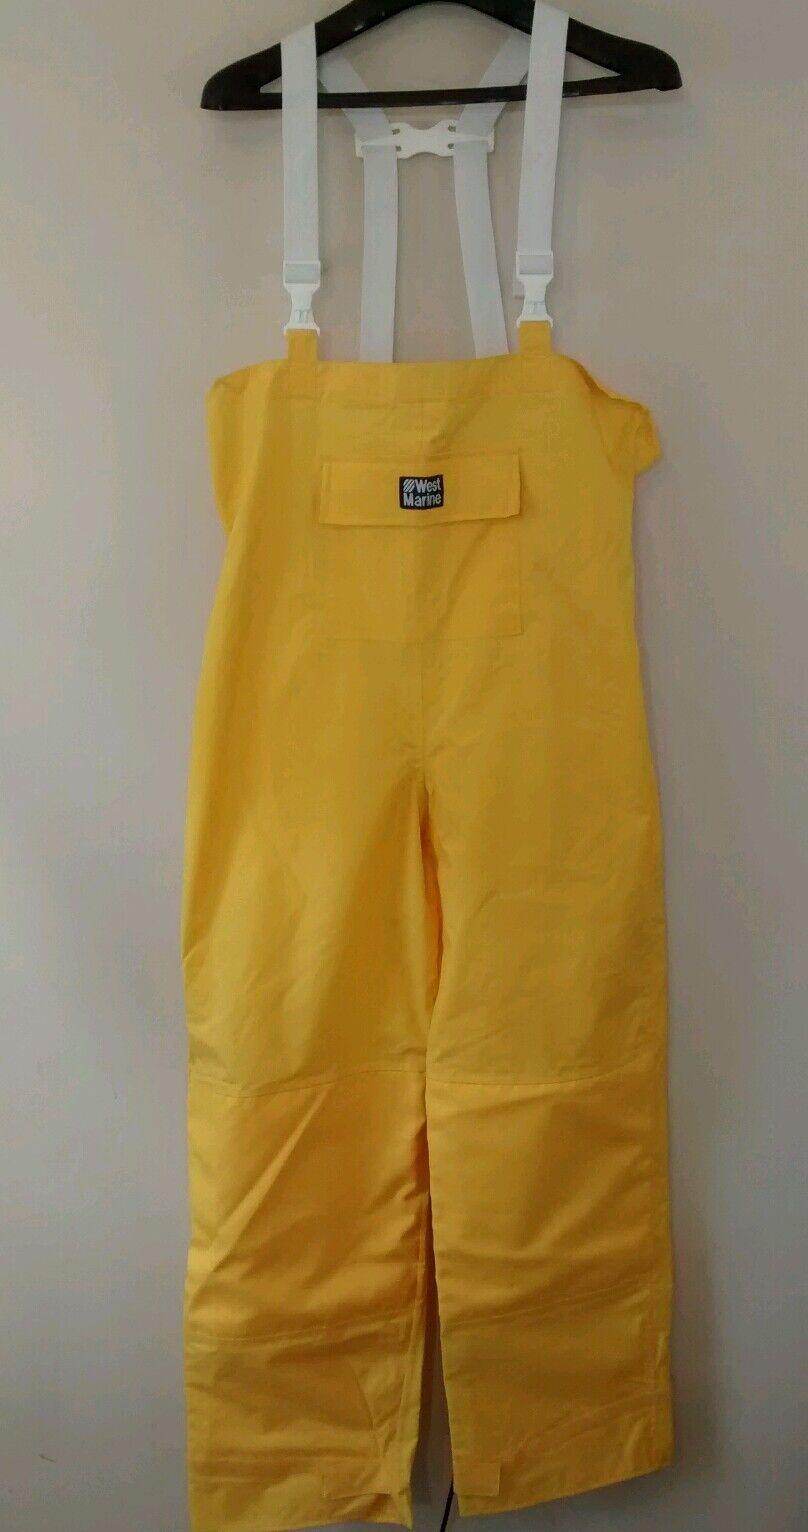 West Marine Yellow Bib Fishing  Rain Boating Nylon Pants M  sale with high discount